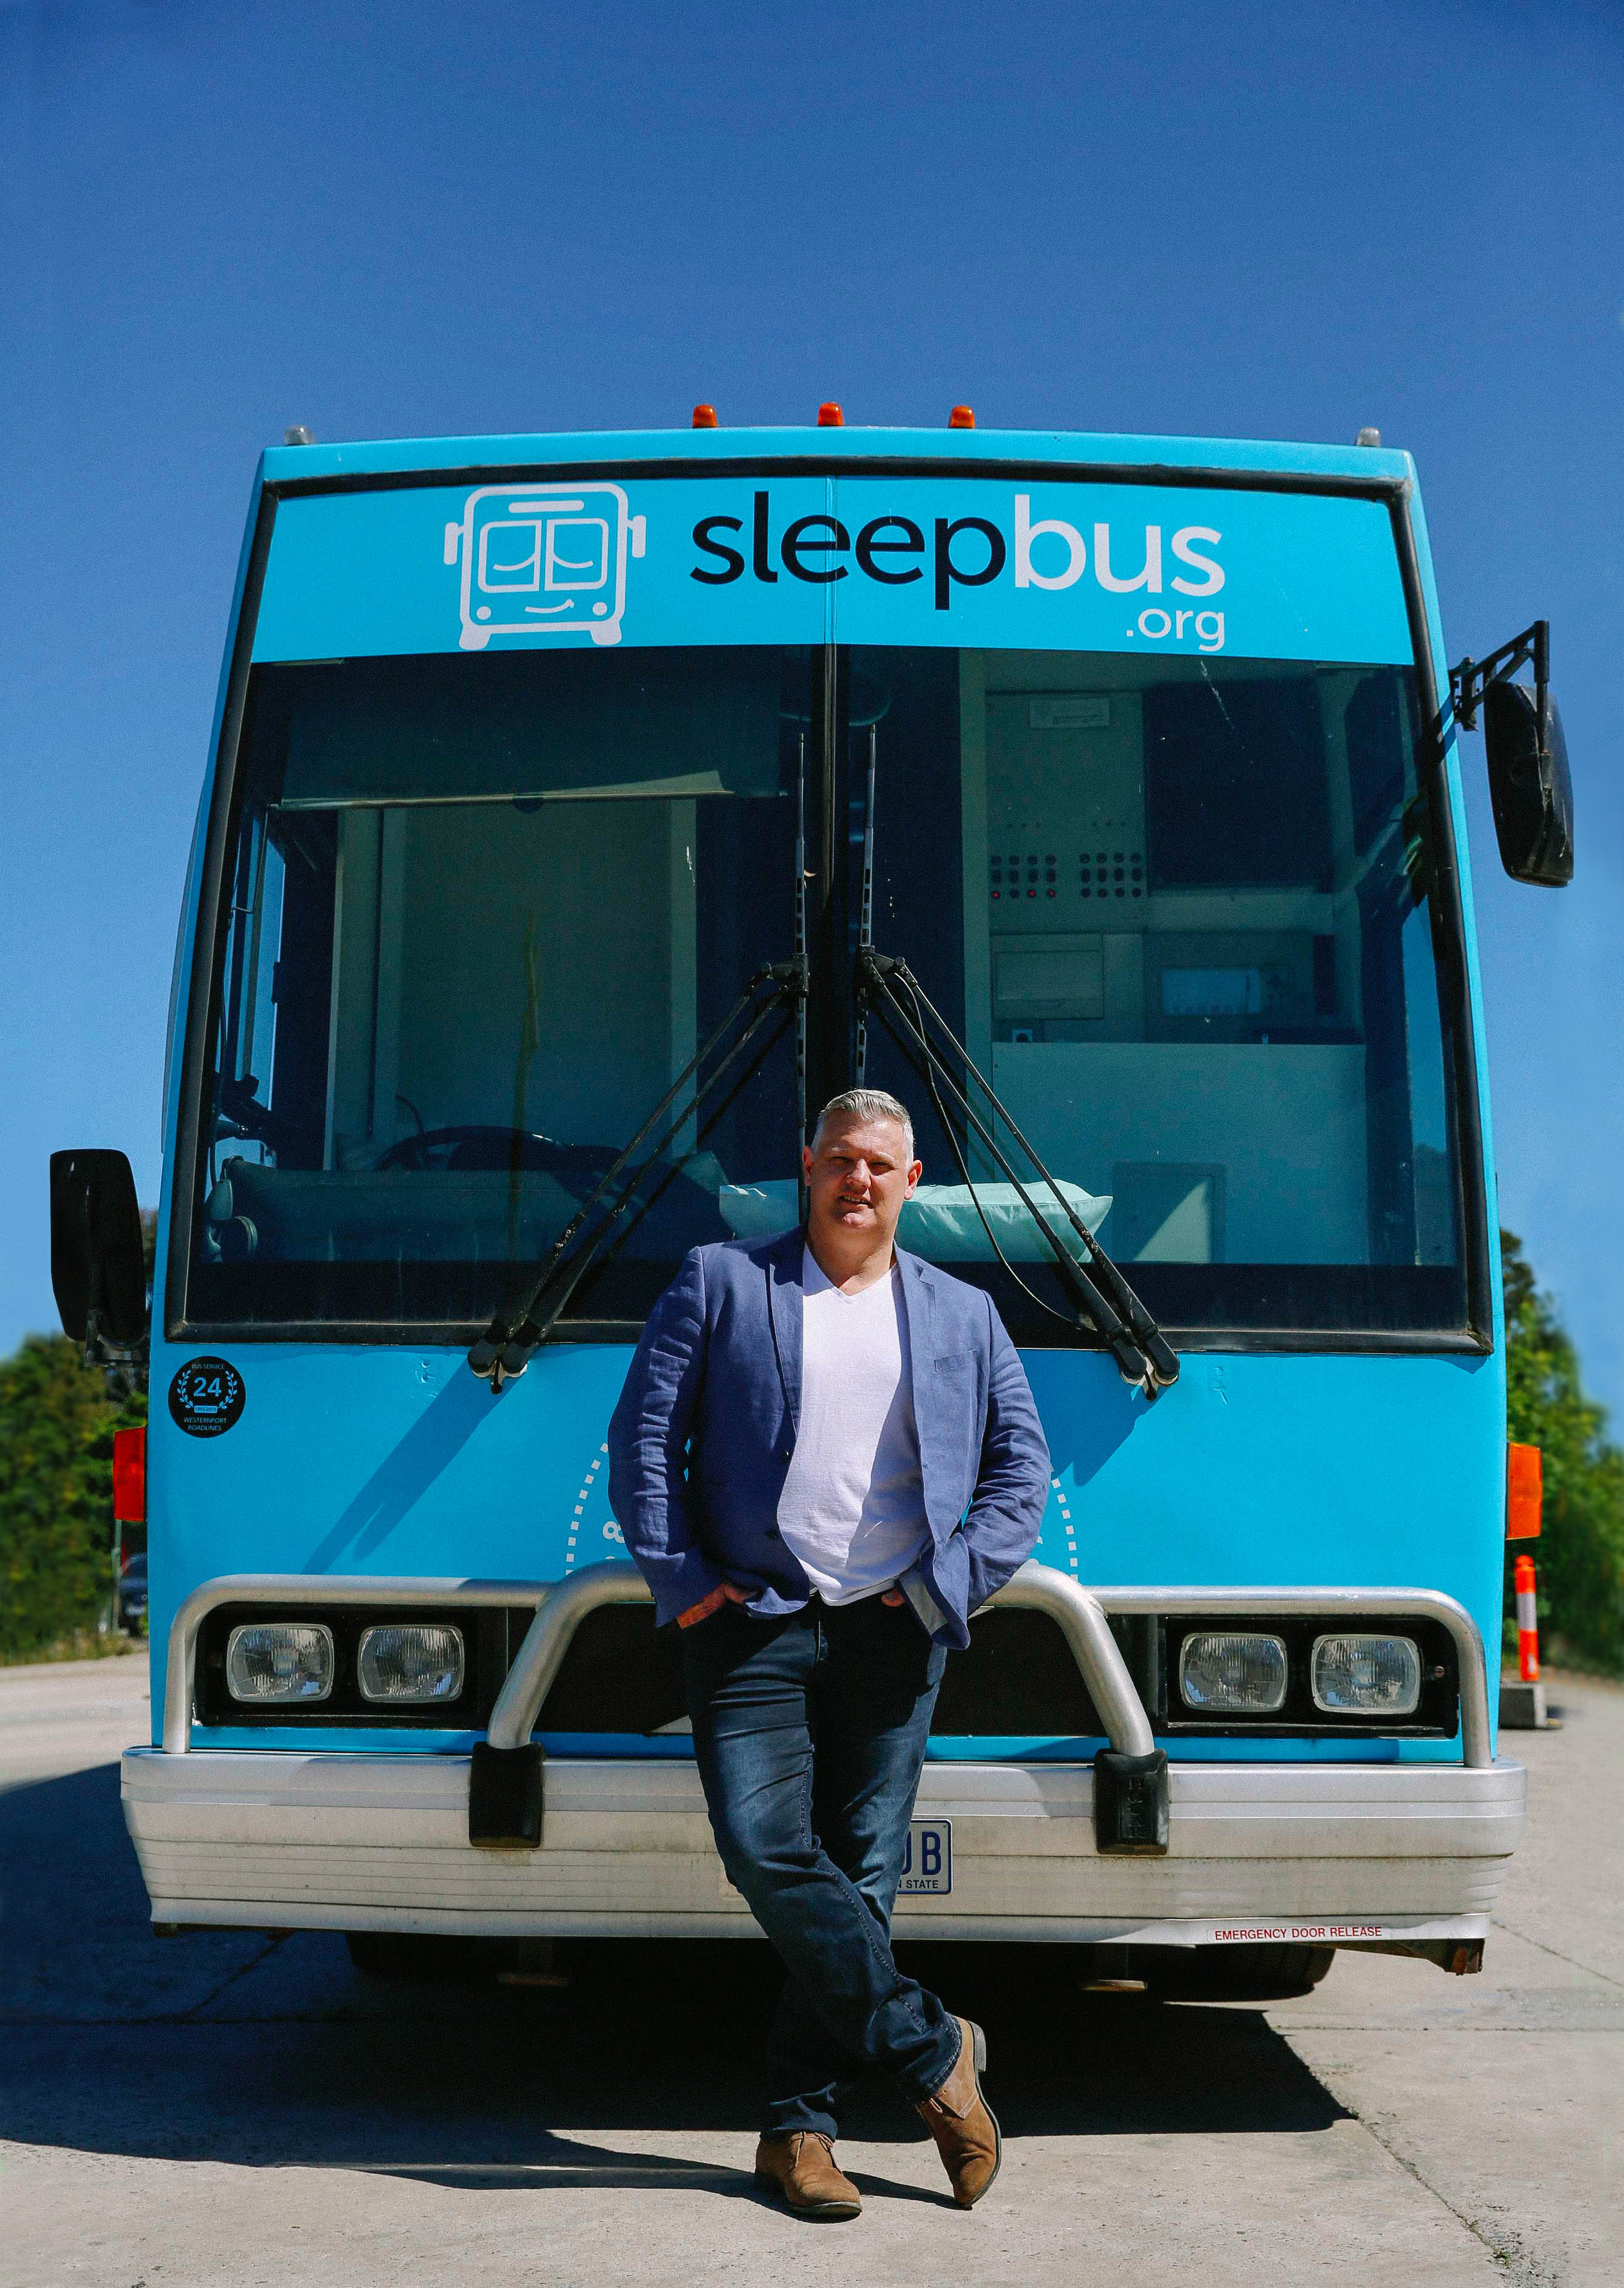 sleepbus : Home